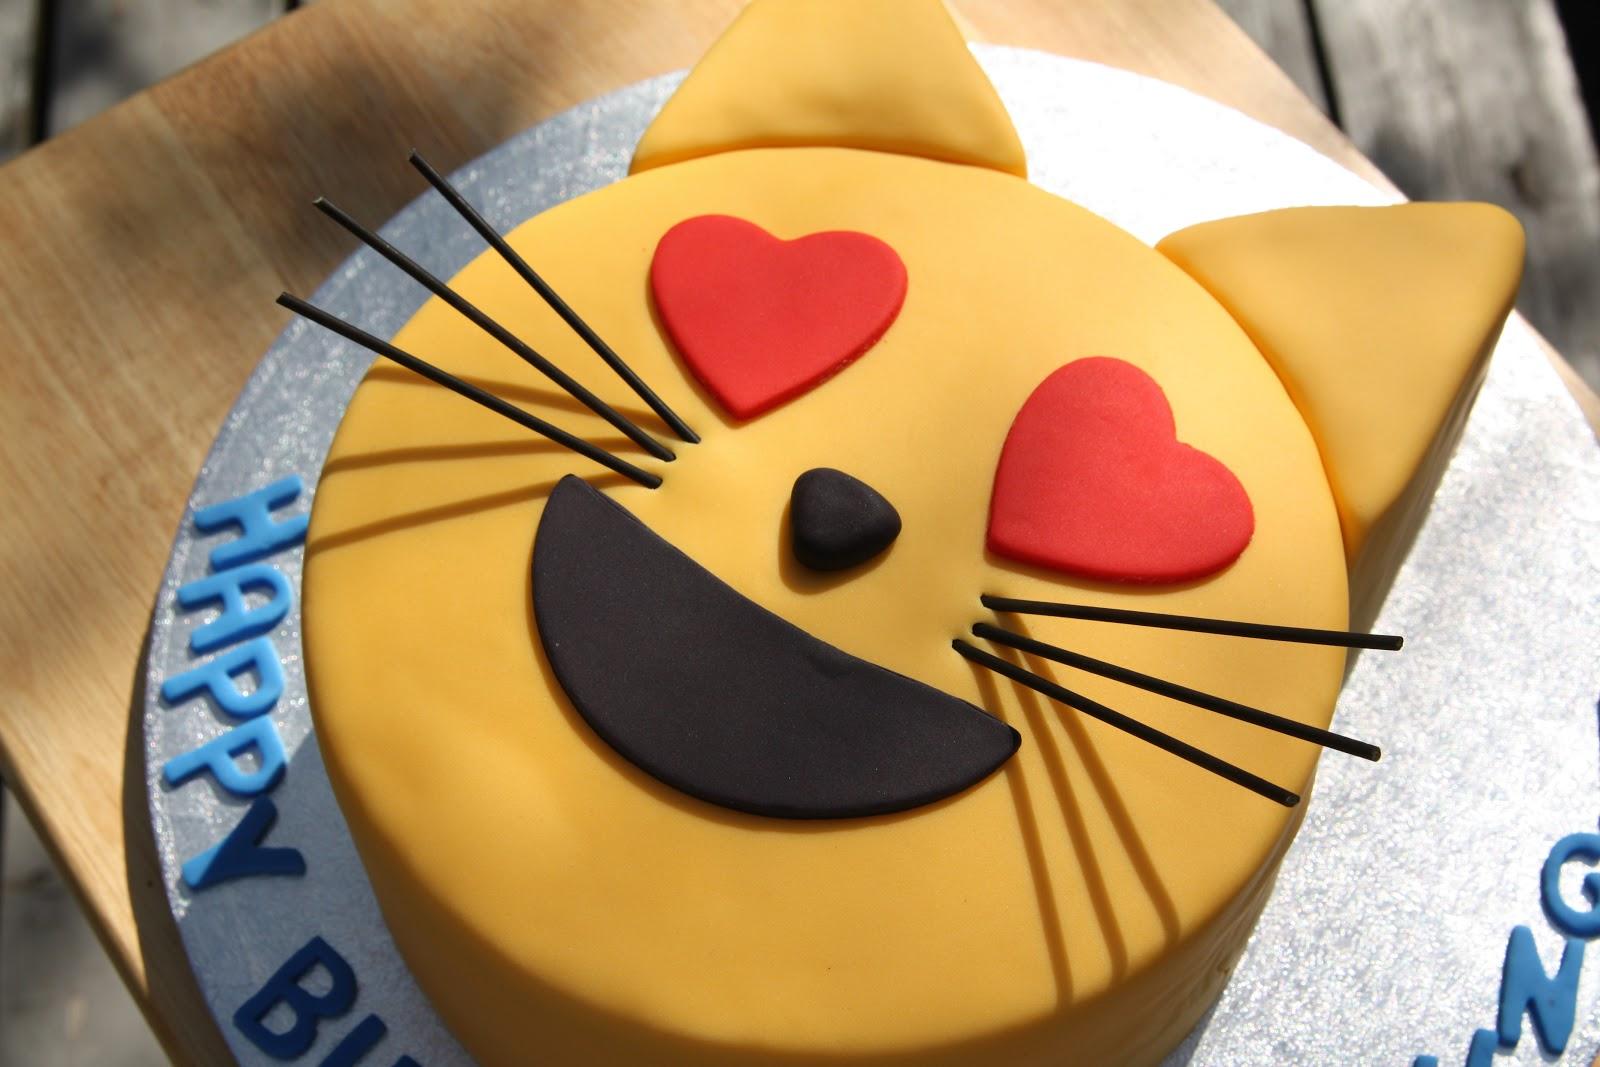 how to make cat poop cake